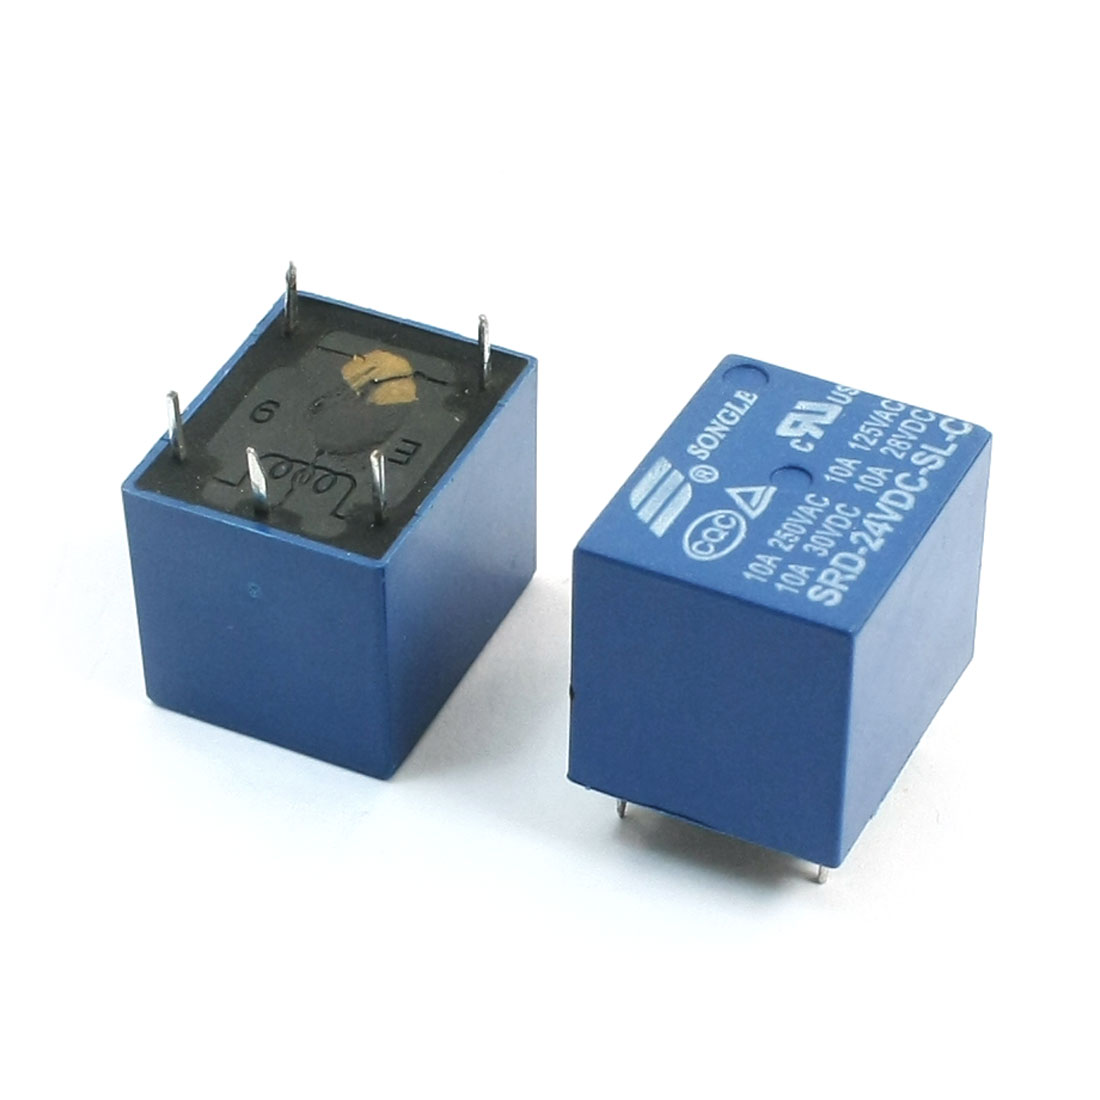 2 Pcs SRD-24VDC-SL-C DC 24V Coil Voltage SPDT 1NO 1NC 5 Pins Blue Plastic General Purpose Power Relay